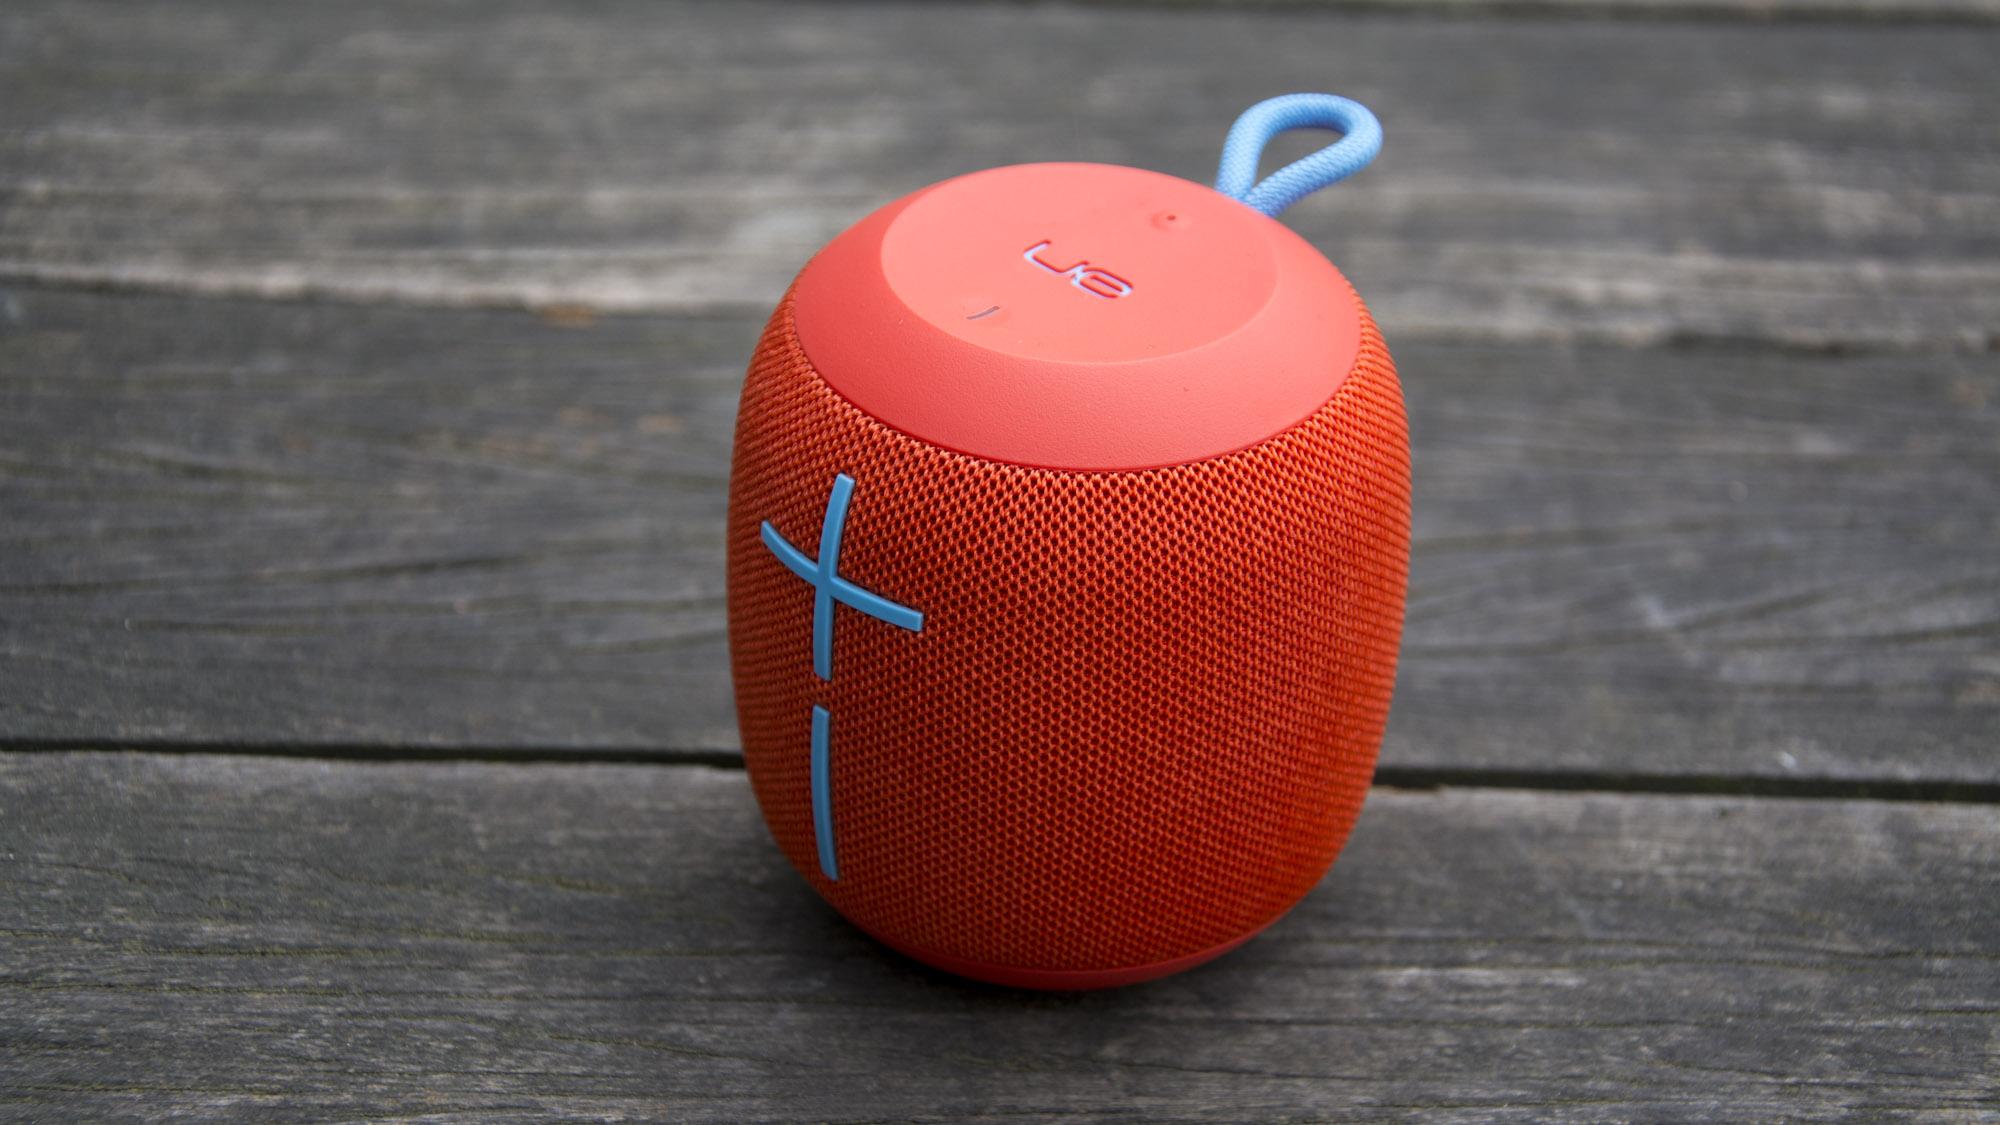 Ubuntu 17 10 Makes It Easier to Use Bluetooth Speakers - OMG